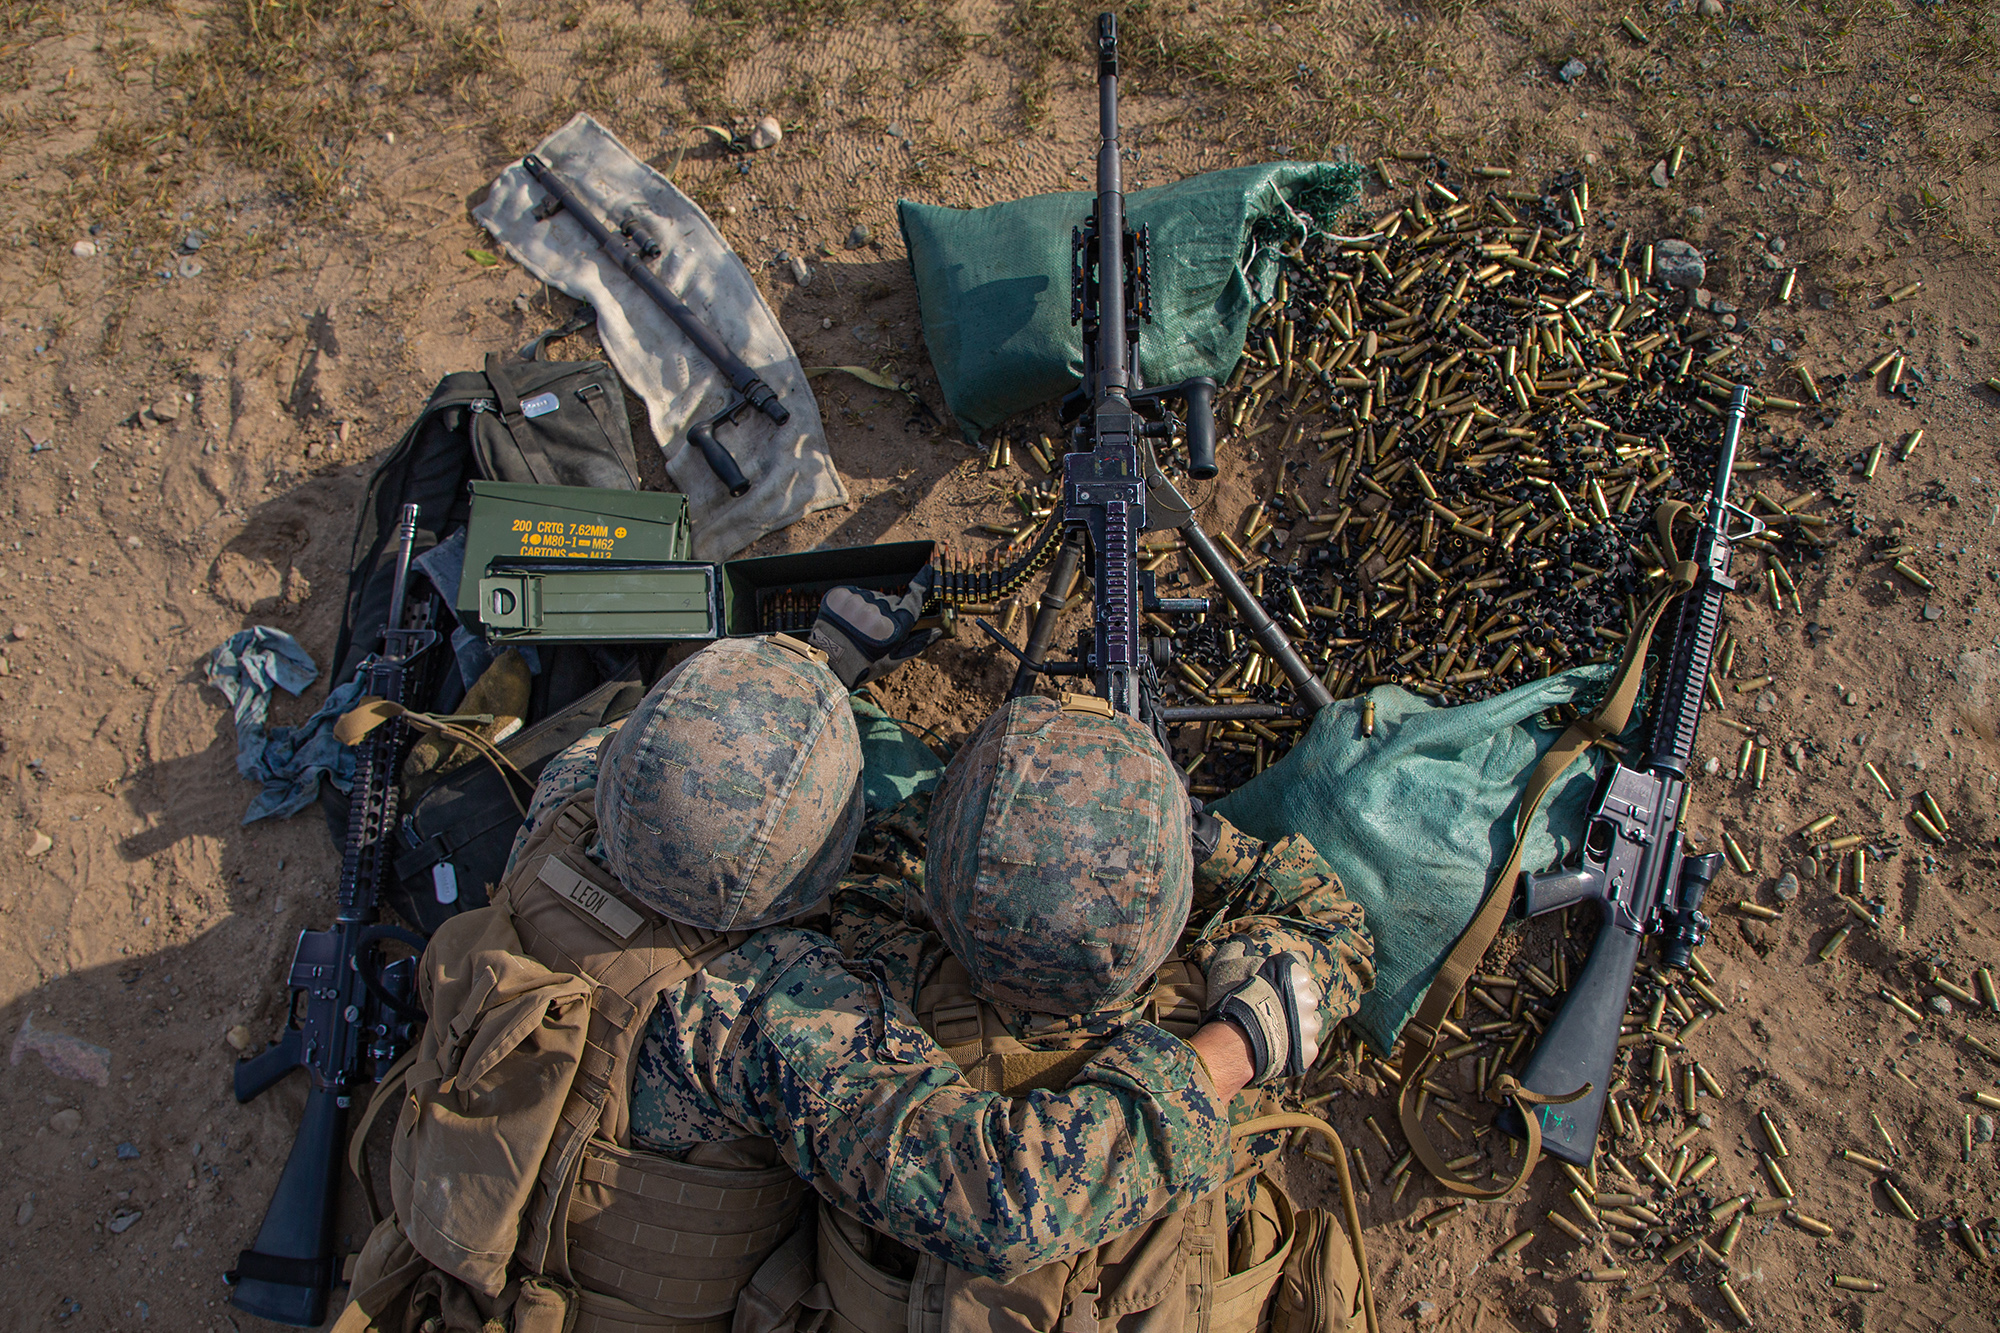 Marines fire an M240B machine gun during a team defense range as part of MEFEX 21.1 at Fort Drum, N.Y., Nov. 6, 2020. (Lance Cpl. Scott Jenkins/Marine Corps)